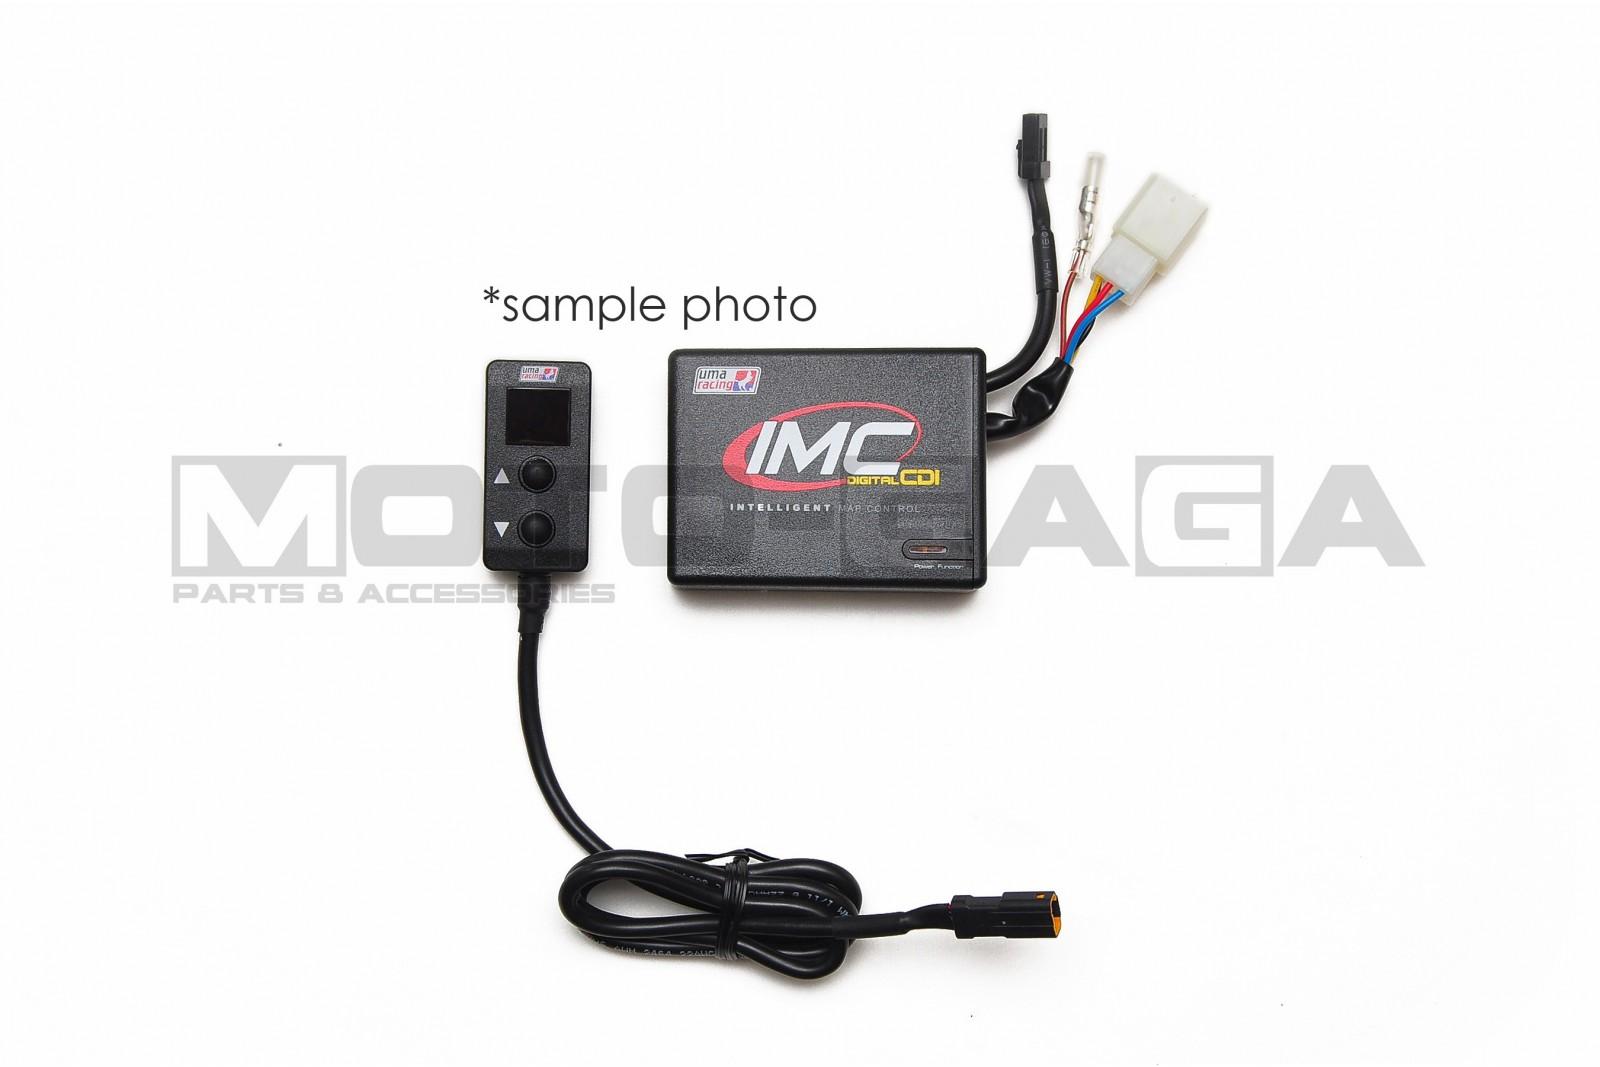 UMA Racing Digital CDi - Yamaha Mio/Nouvo 115 (Non L.C.) on